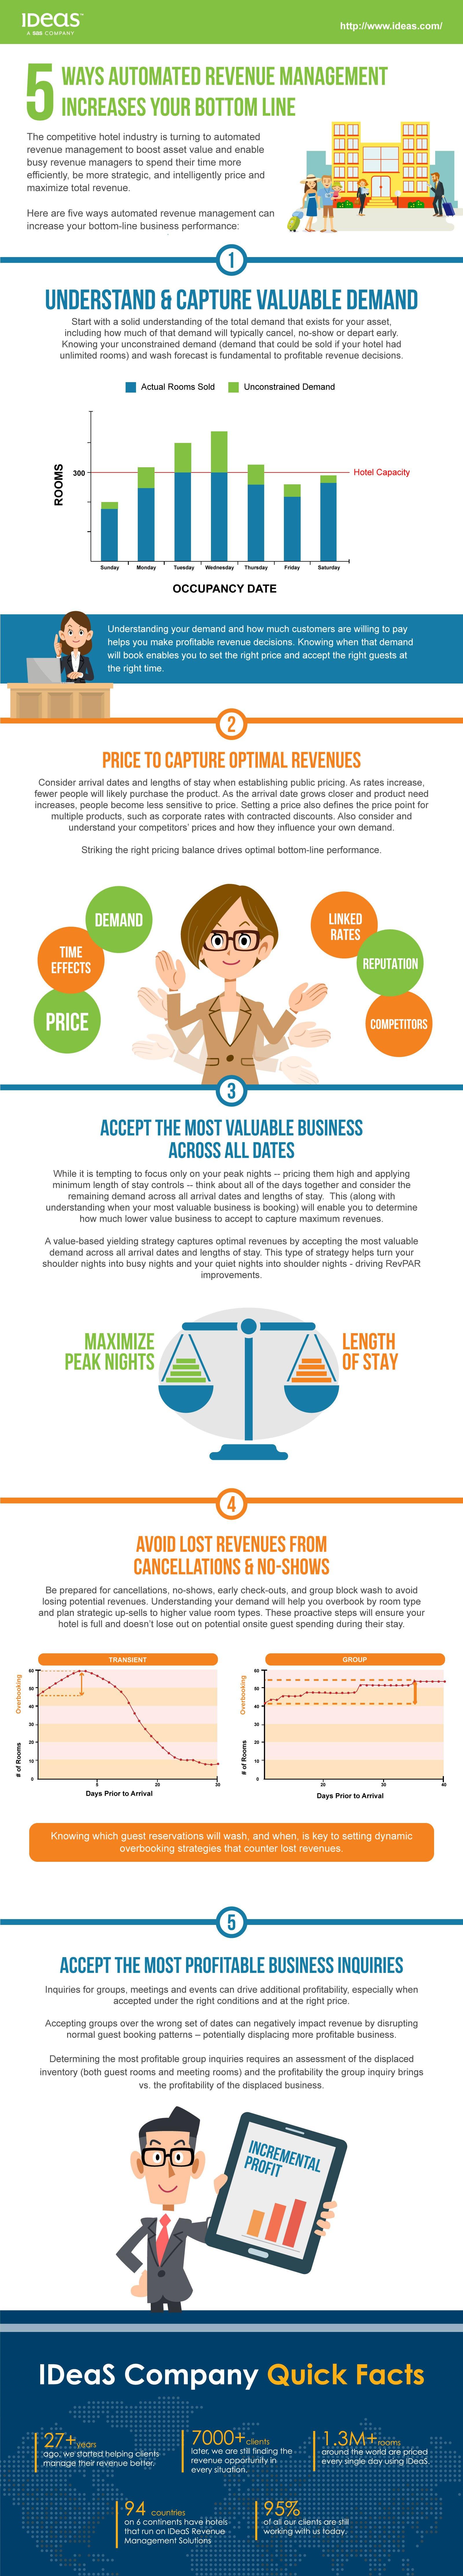 Infographic increasing your bottom line ideas revenue